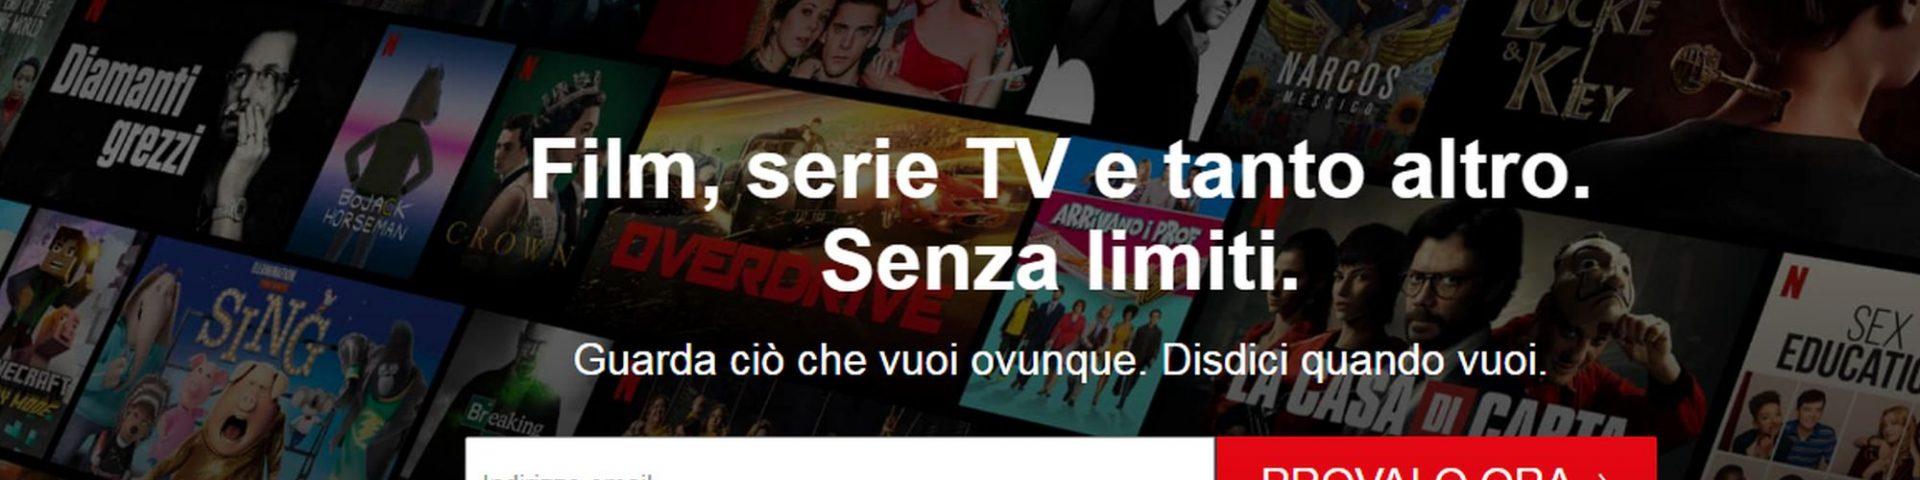 Netflix annuncia la prima serie TV dedicata ad Ayrton Senna